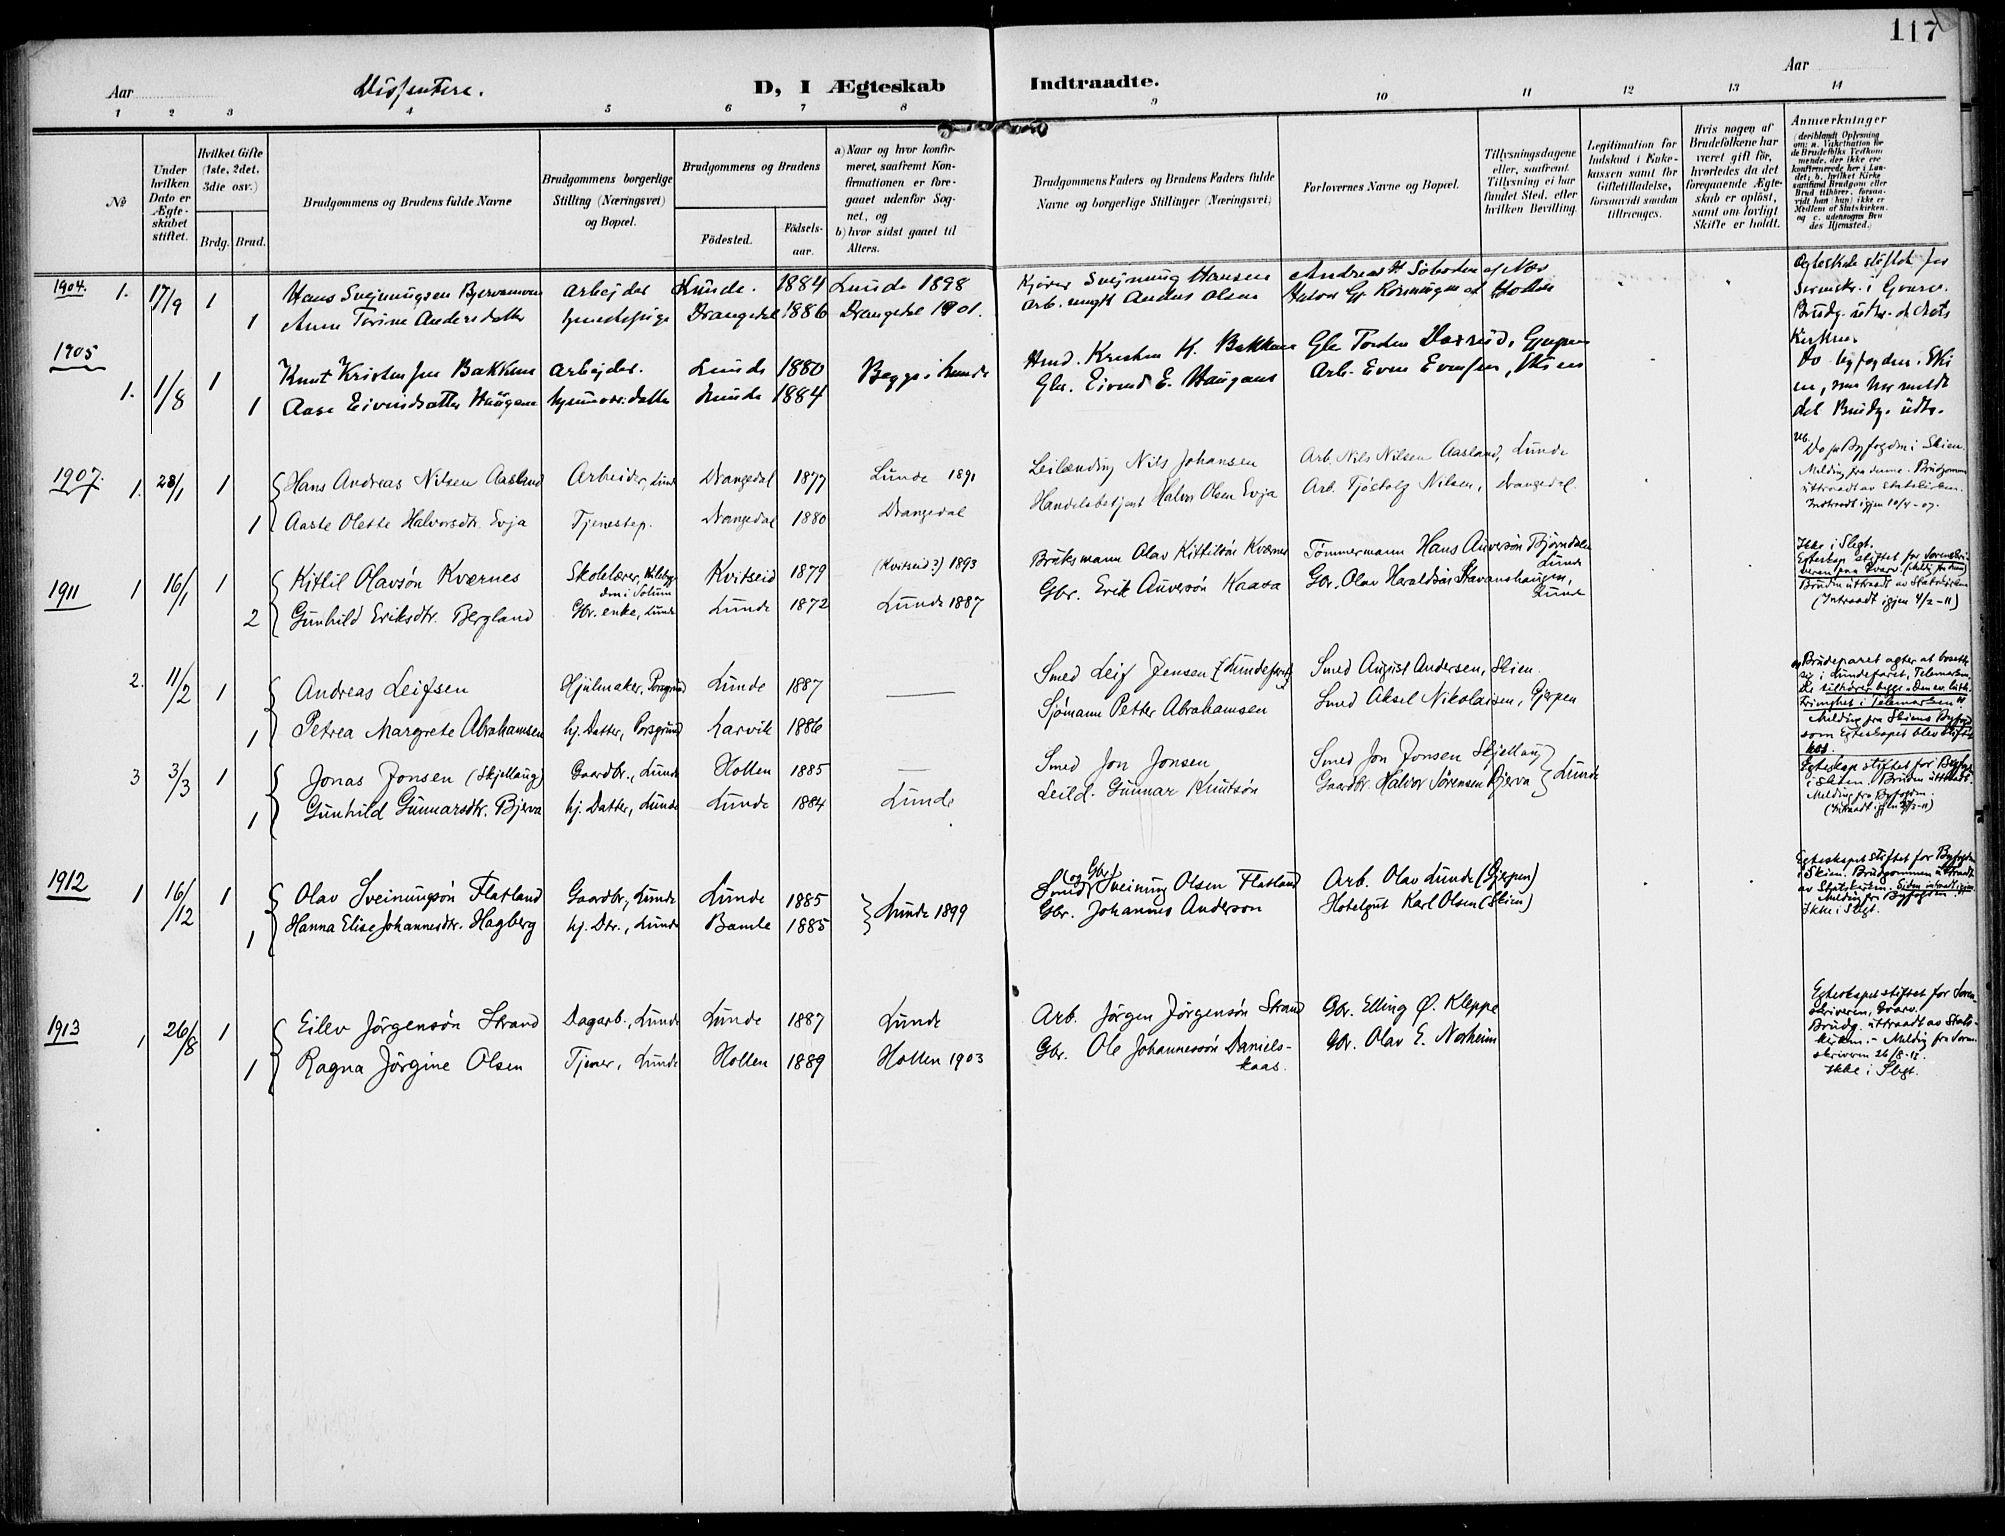 SAKO, Lunde kirkebøker, F/Fa/L0004: Ministerialbok nr. I 4, 1902-1913, s. 117